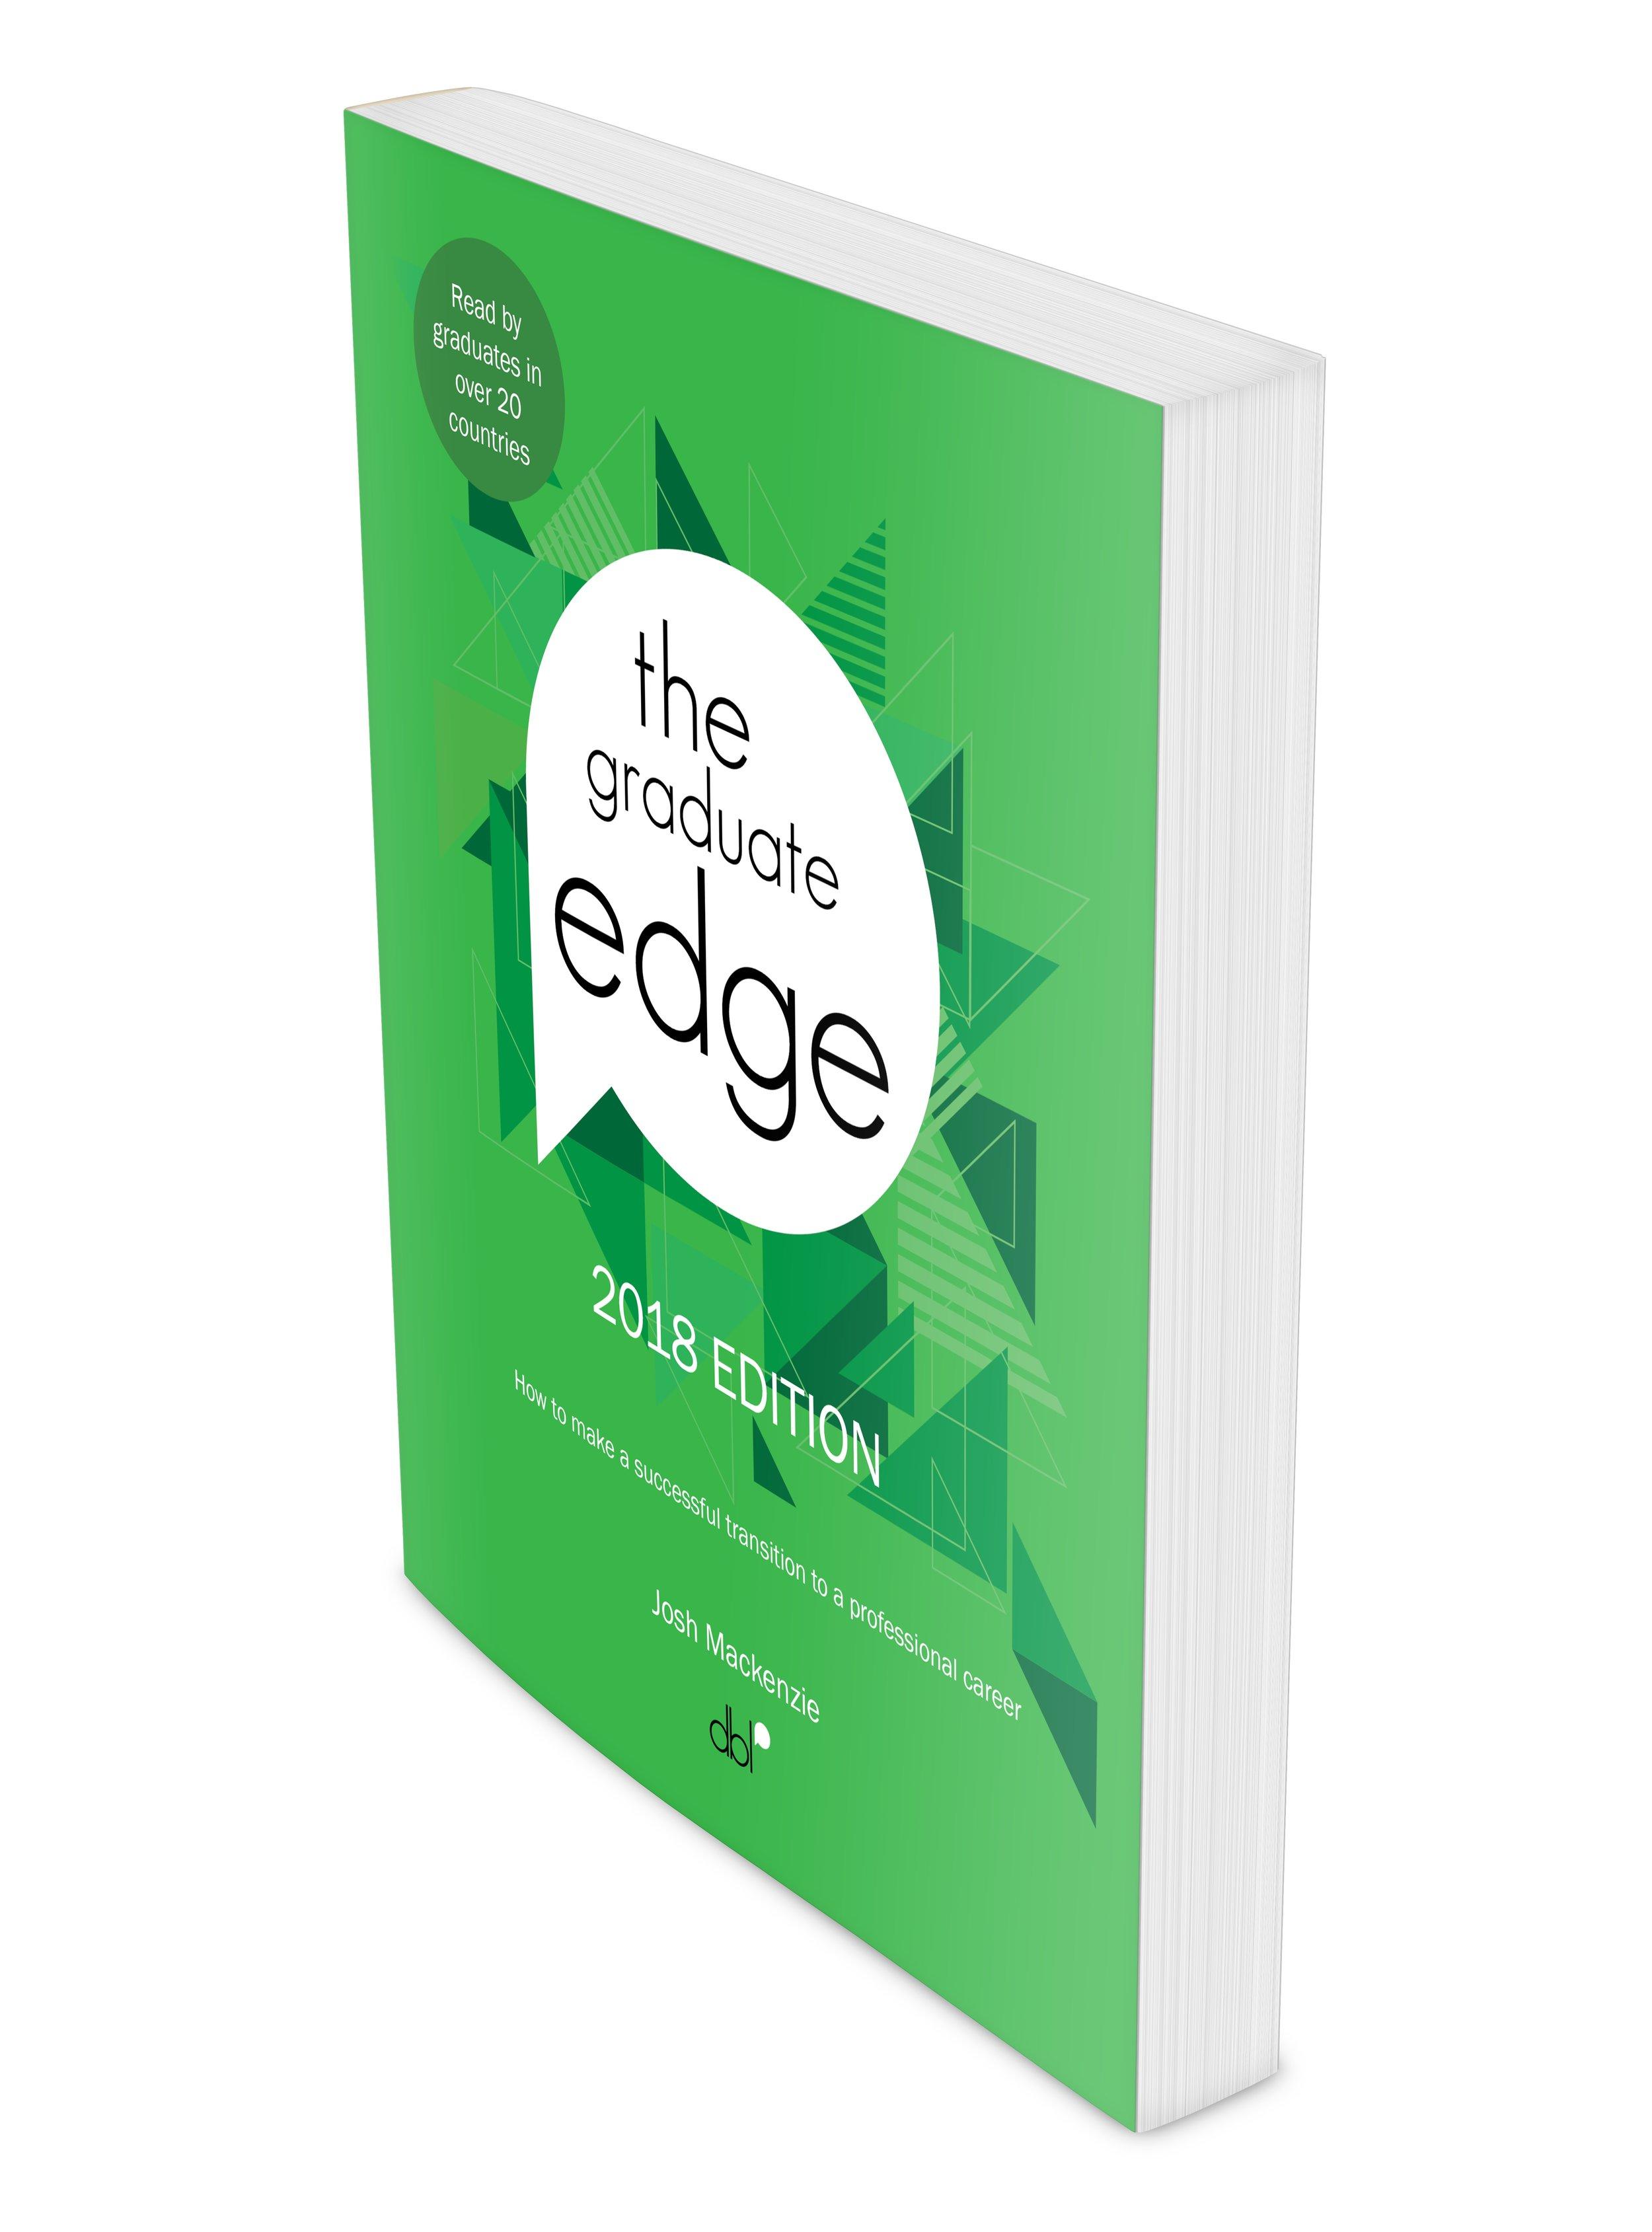 Graduate-Edge-Book-2018-Edition2_3D (1) copy.jpg